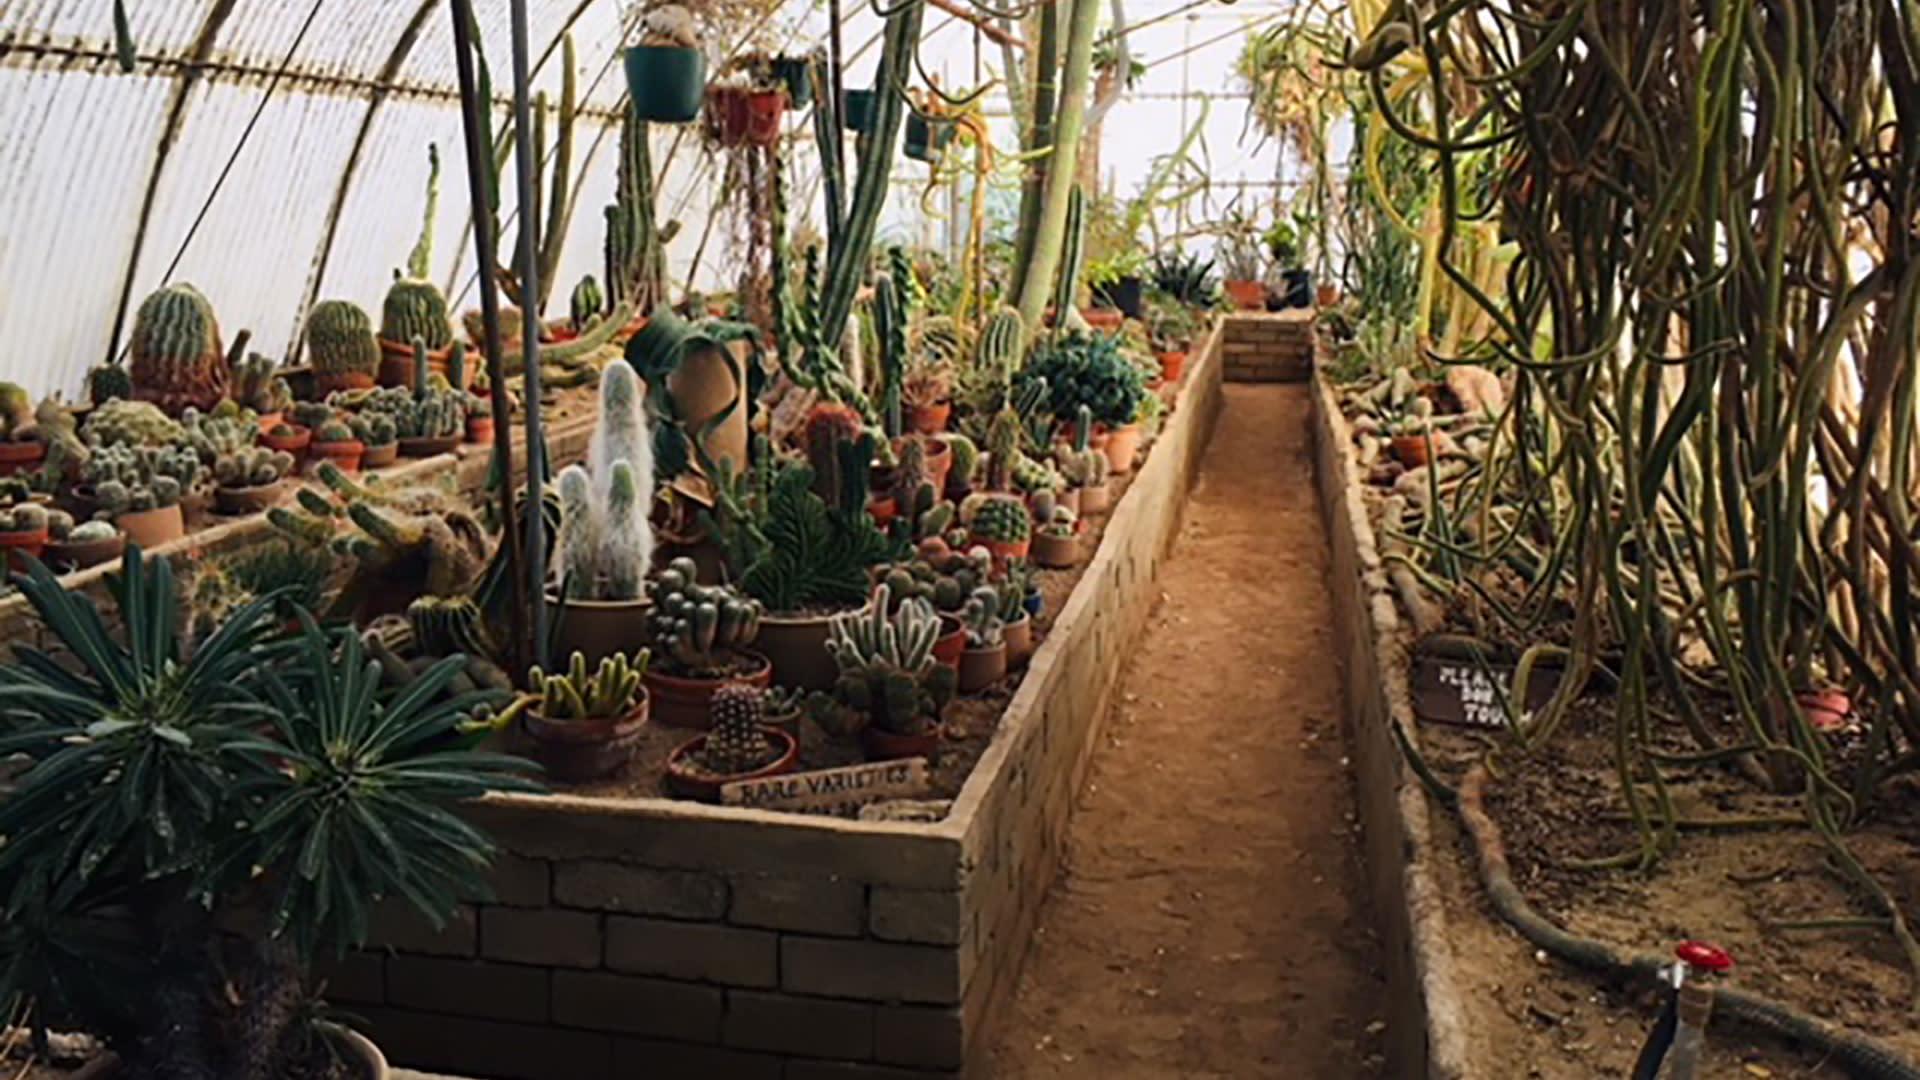 moortens botanical garden